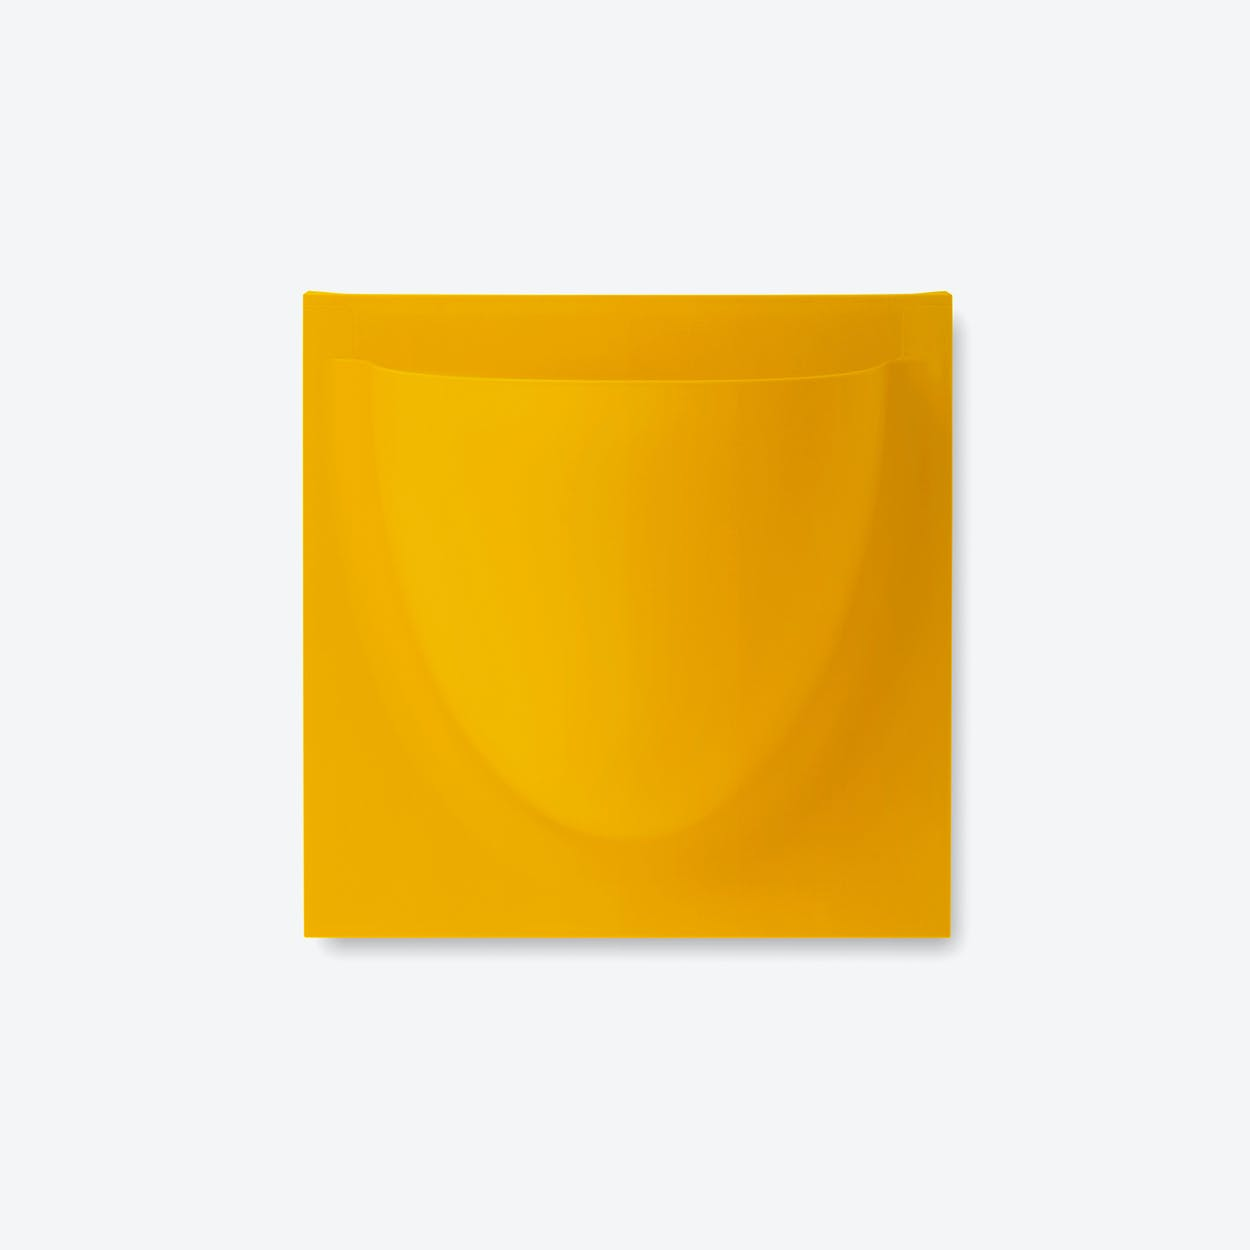 Wall Planter / Jar Mini in Dark Yellow (Set of 2)